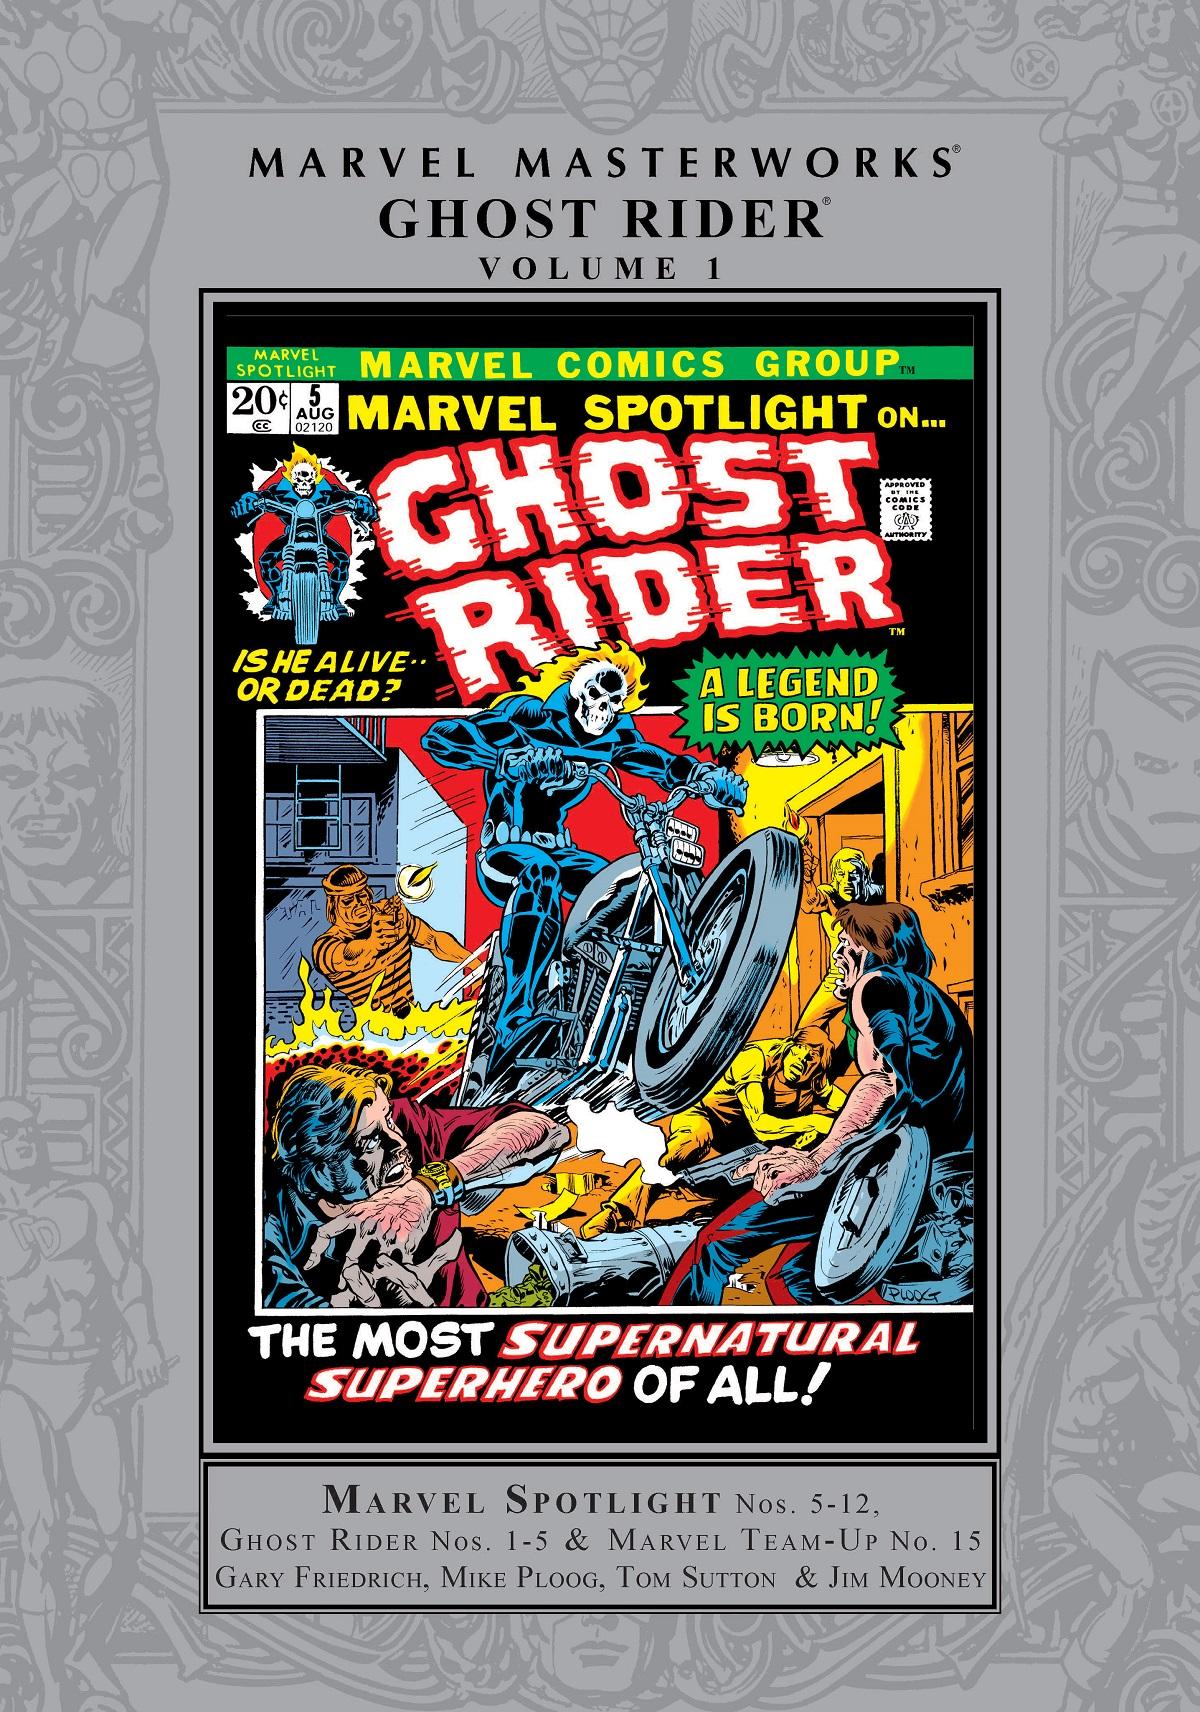 Marvel Masterworks: Ghost Rider Vol. 1 (Hardcover)